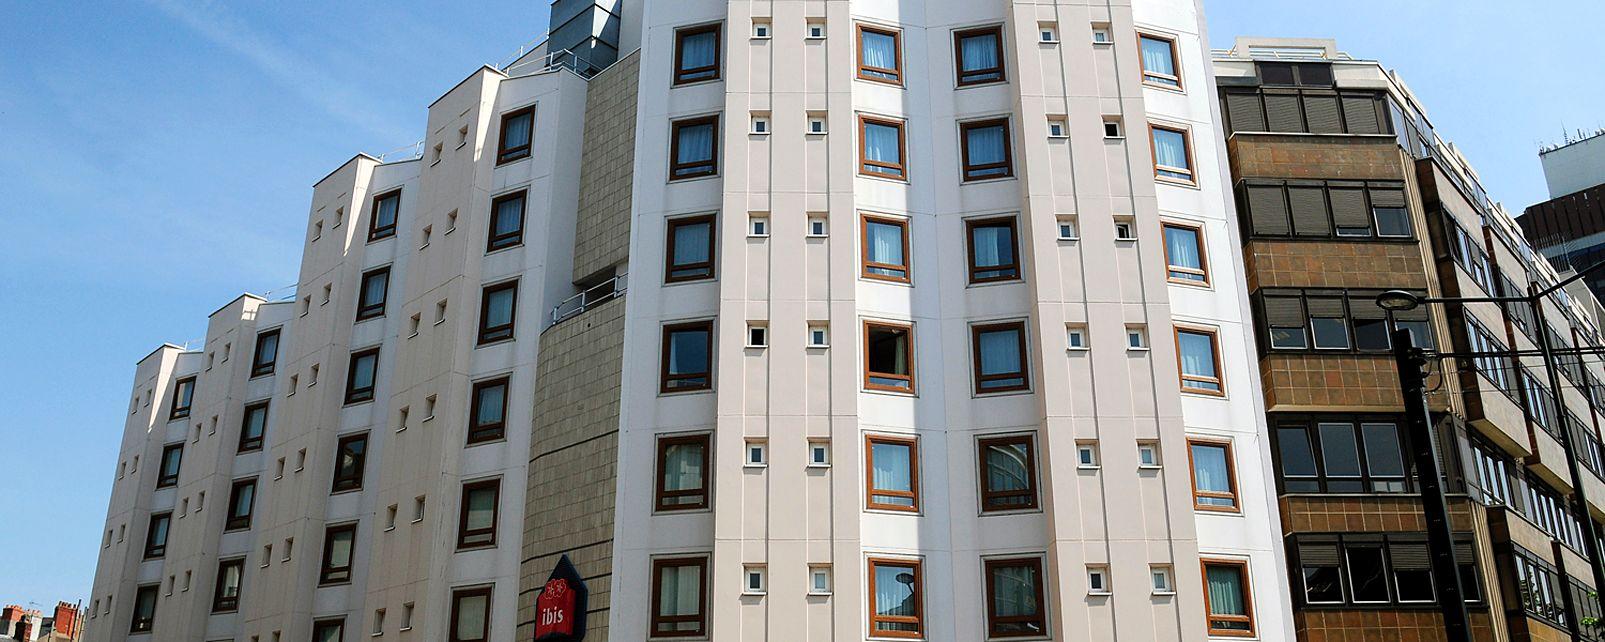 H tel ibis nantes centre tour bretagne nantes france for Hotel france nantes